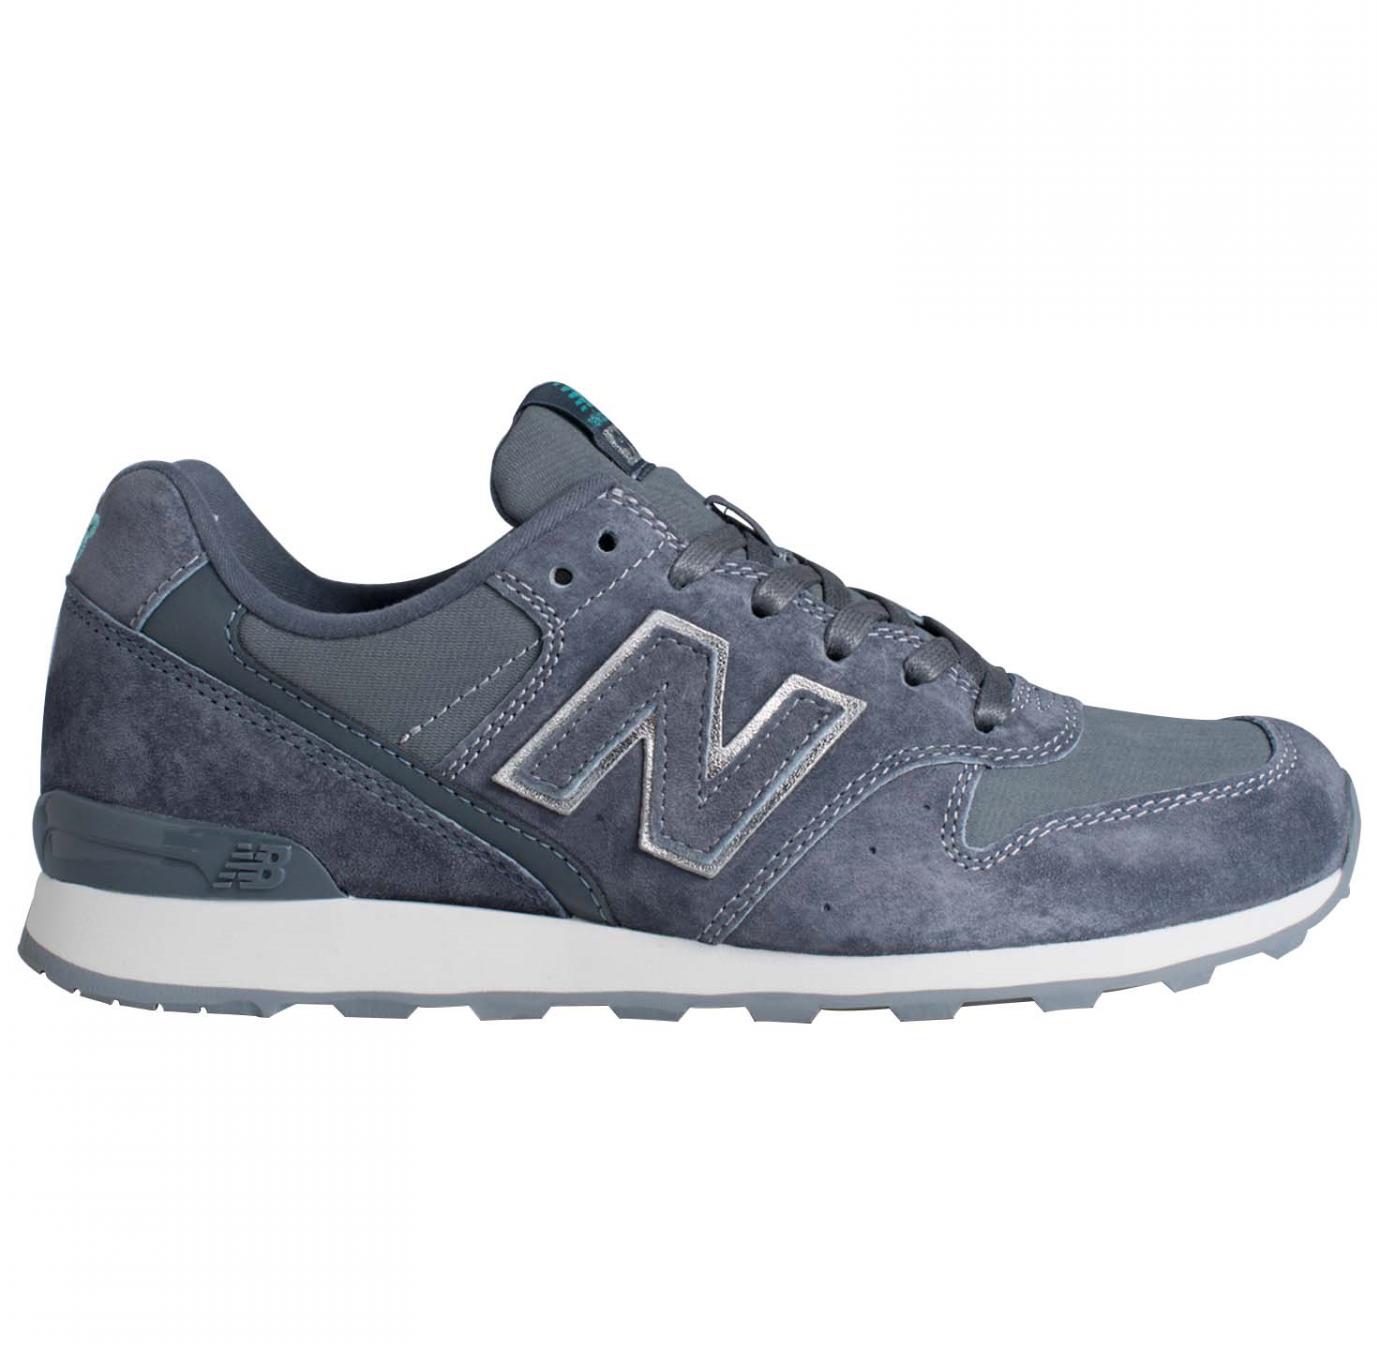 release date 8bbe5 95f8d New Balance WR996 Sneaker Damen Freizeitschuhe blau